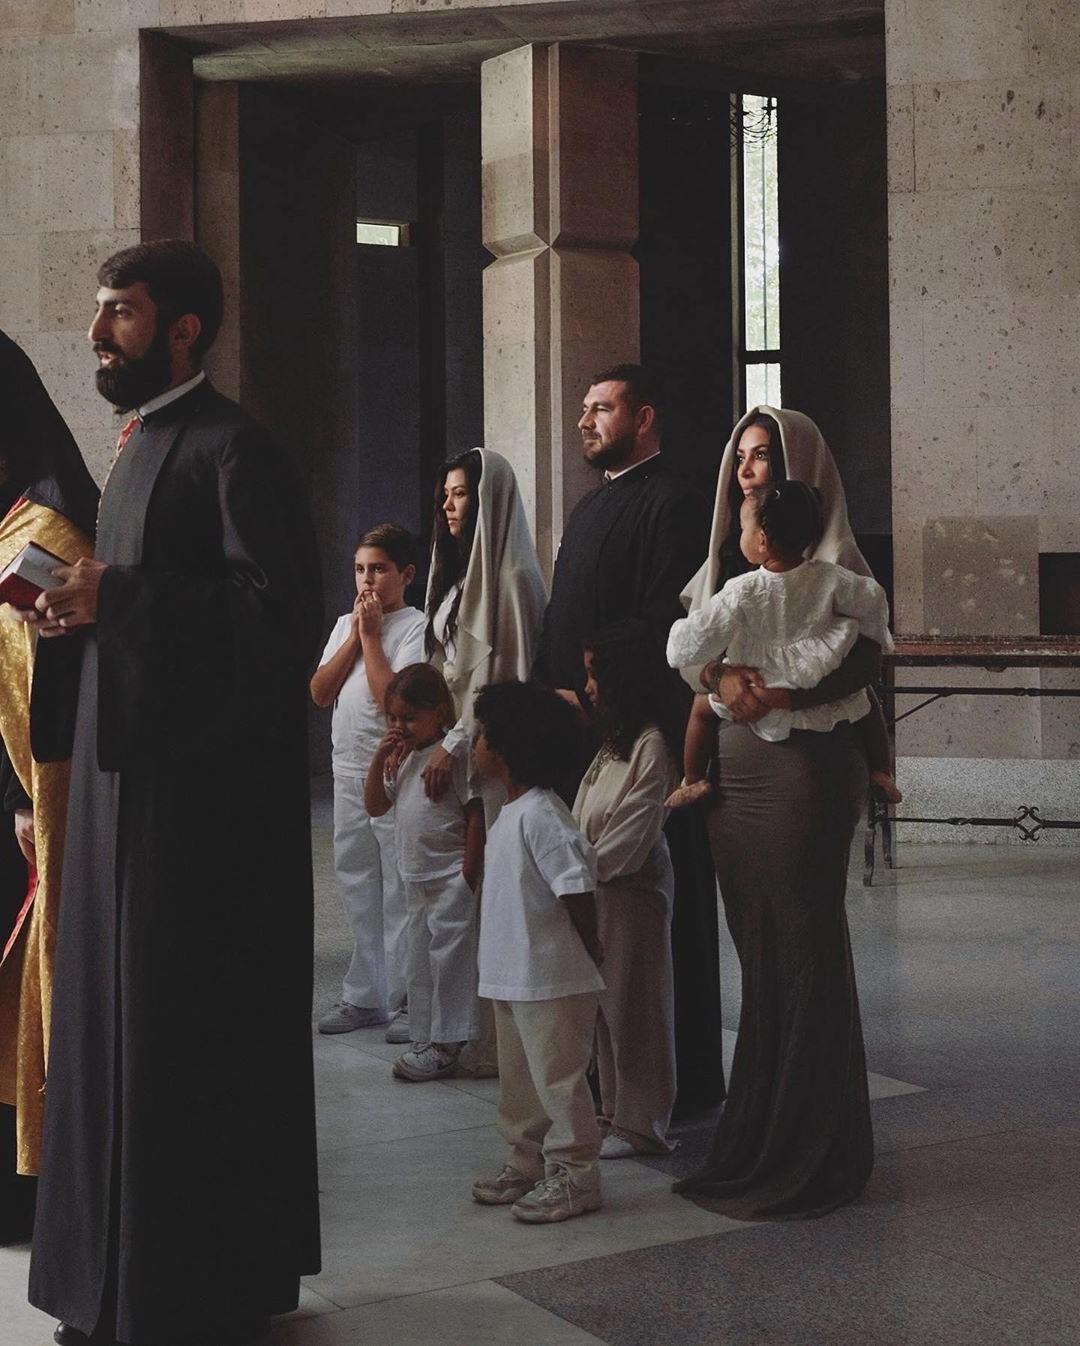 Kim Kardashian And Her Kids Baptized In Armenian Church #8 | Her Beauty